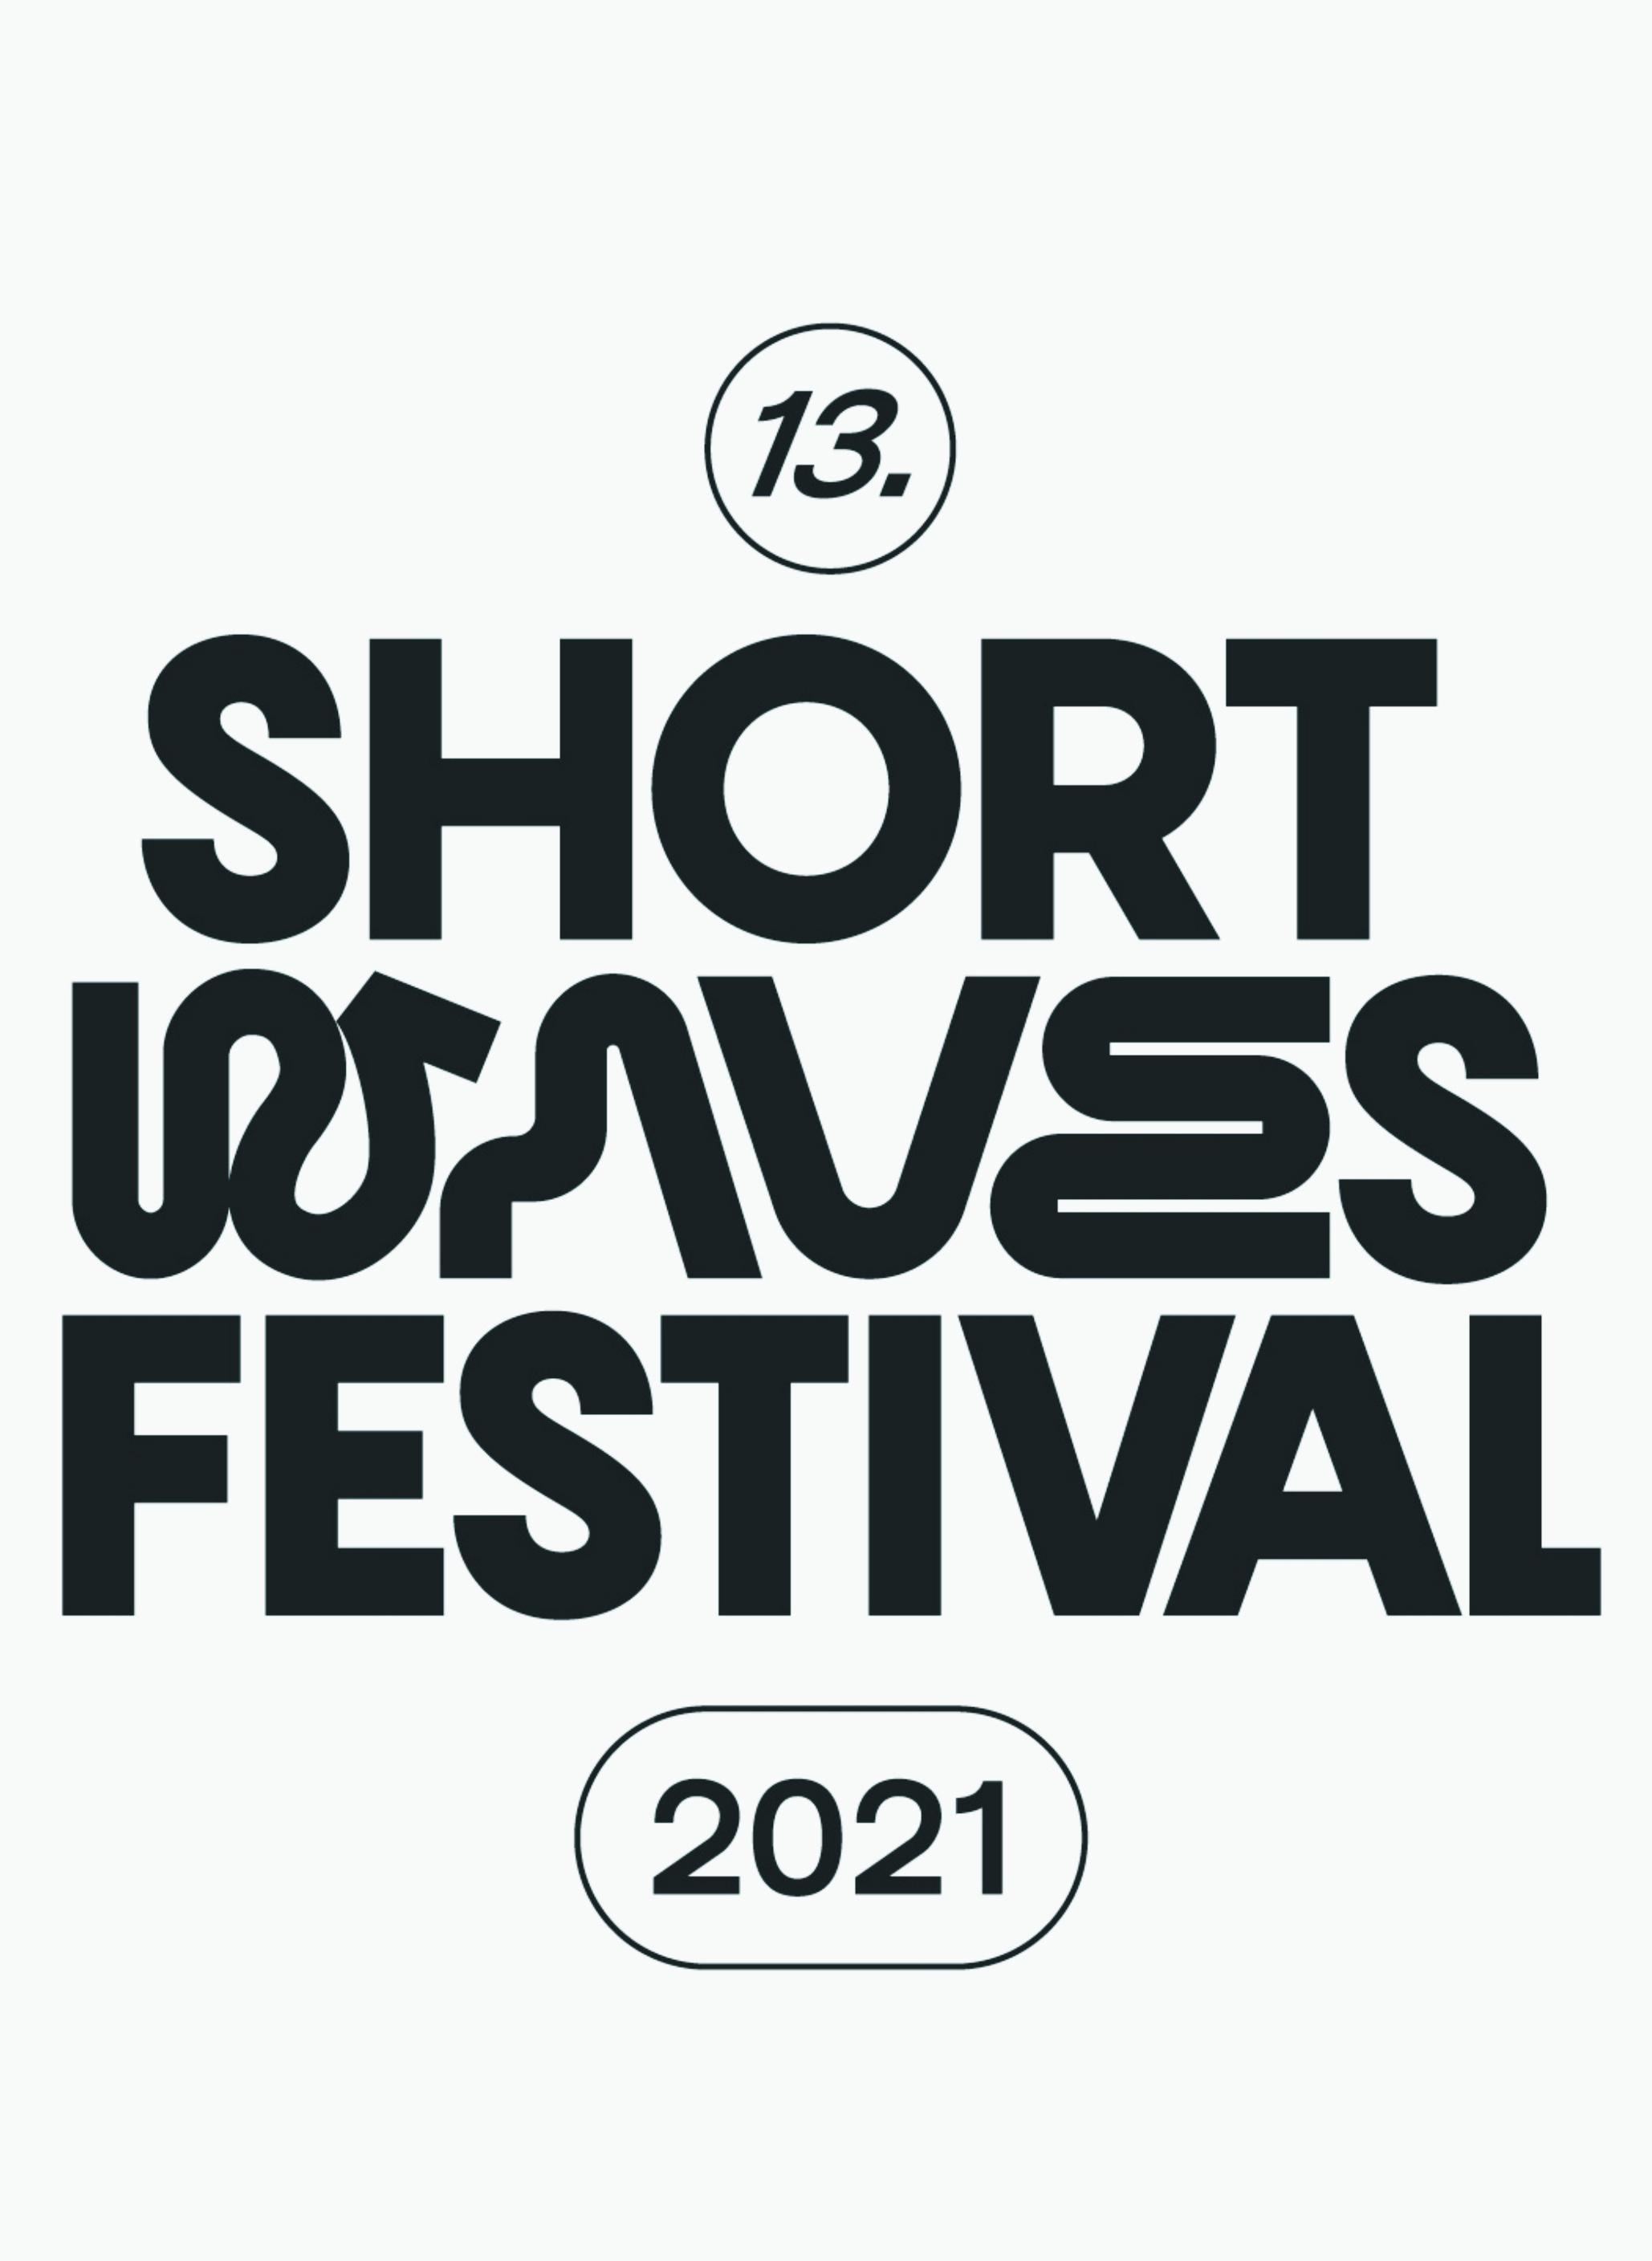 Short Waves Festival 2021 - SWF Awarded: IC